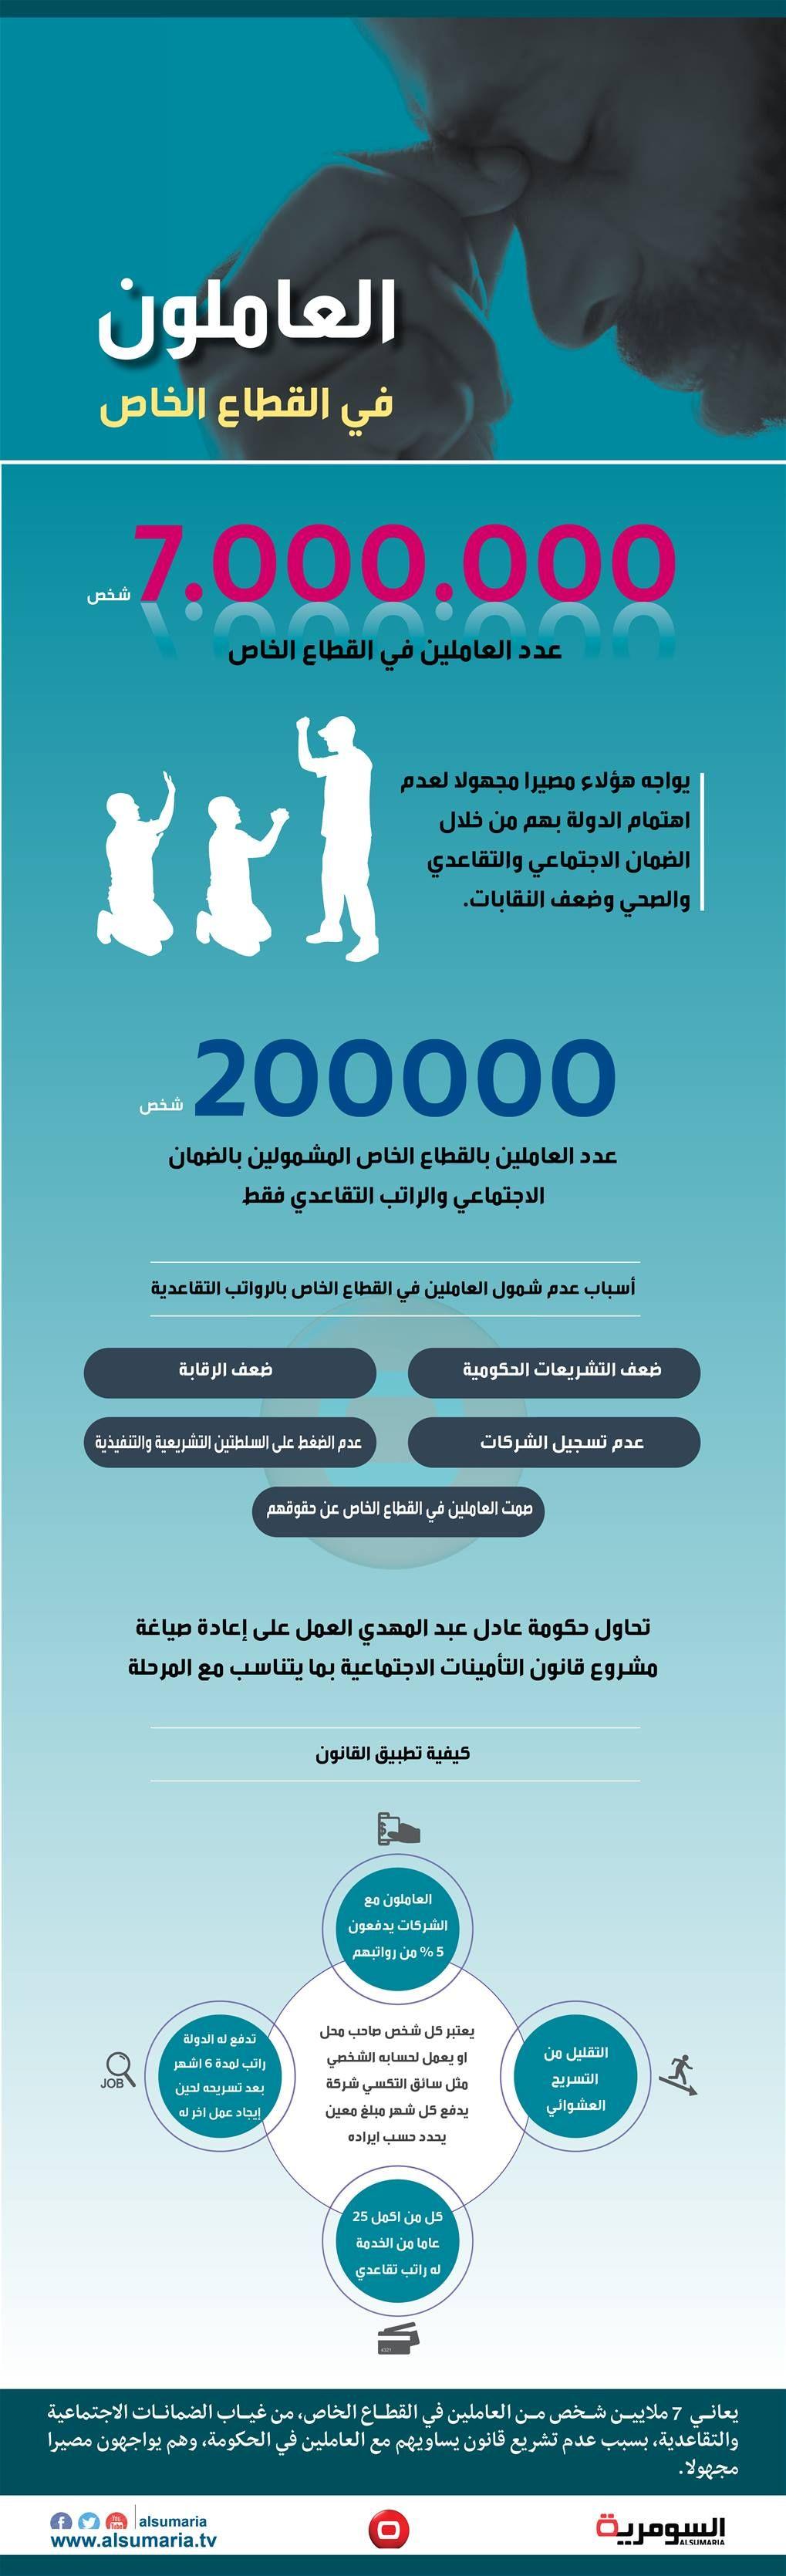 بالانفوغراف 7 ملايين عراقي امام مصير مجهول بسبب قانون التقاعد Infographic Movie Posters